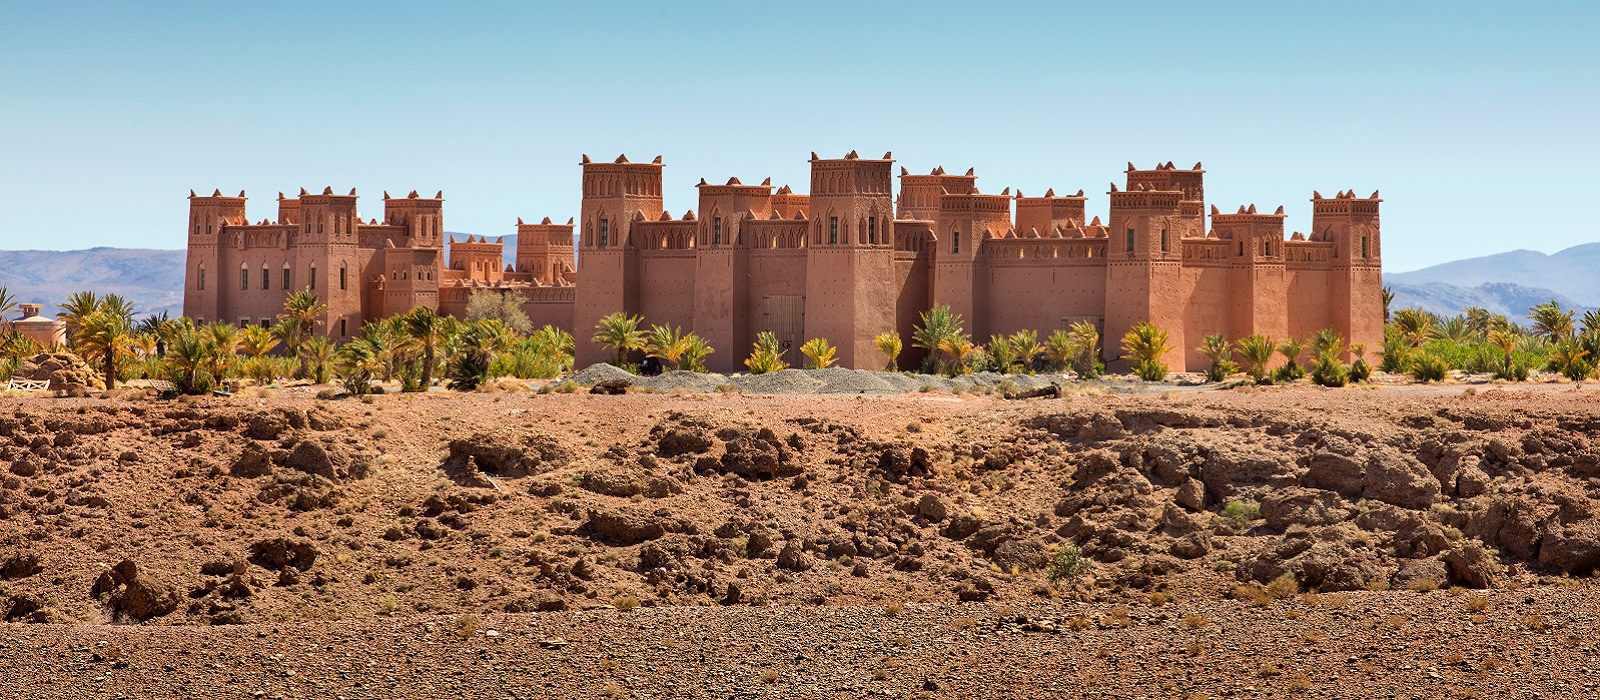 Morocco : Souks, Spices and the Sahara Tour Trip 1